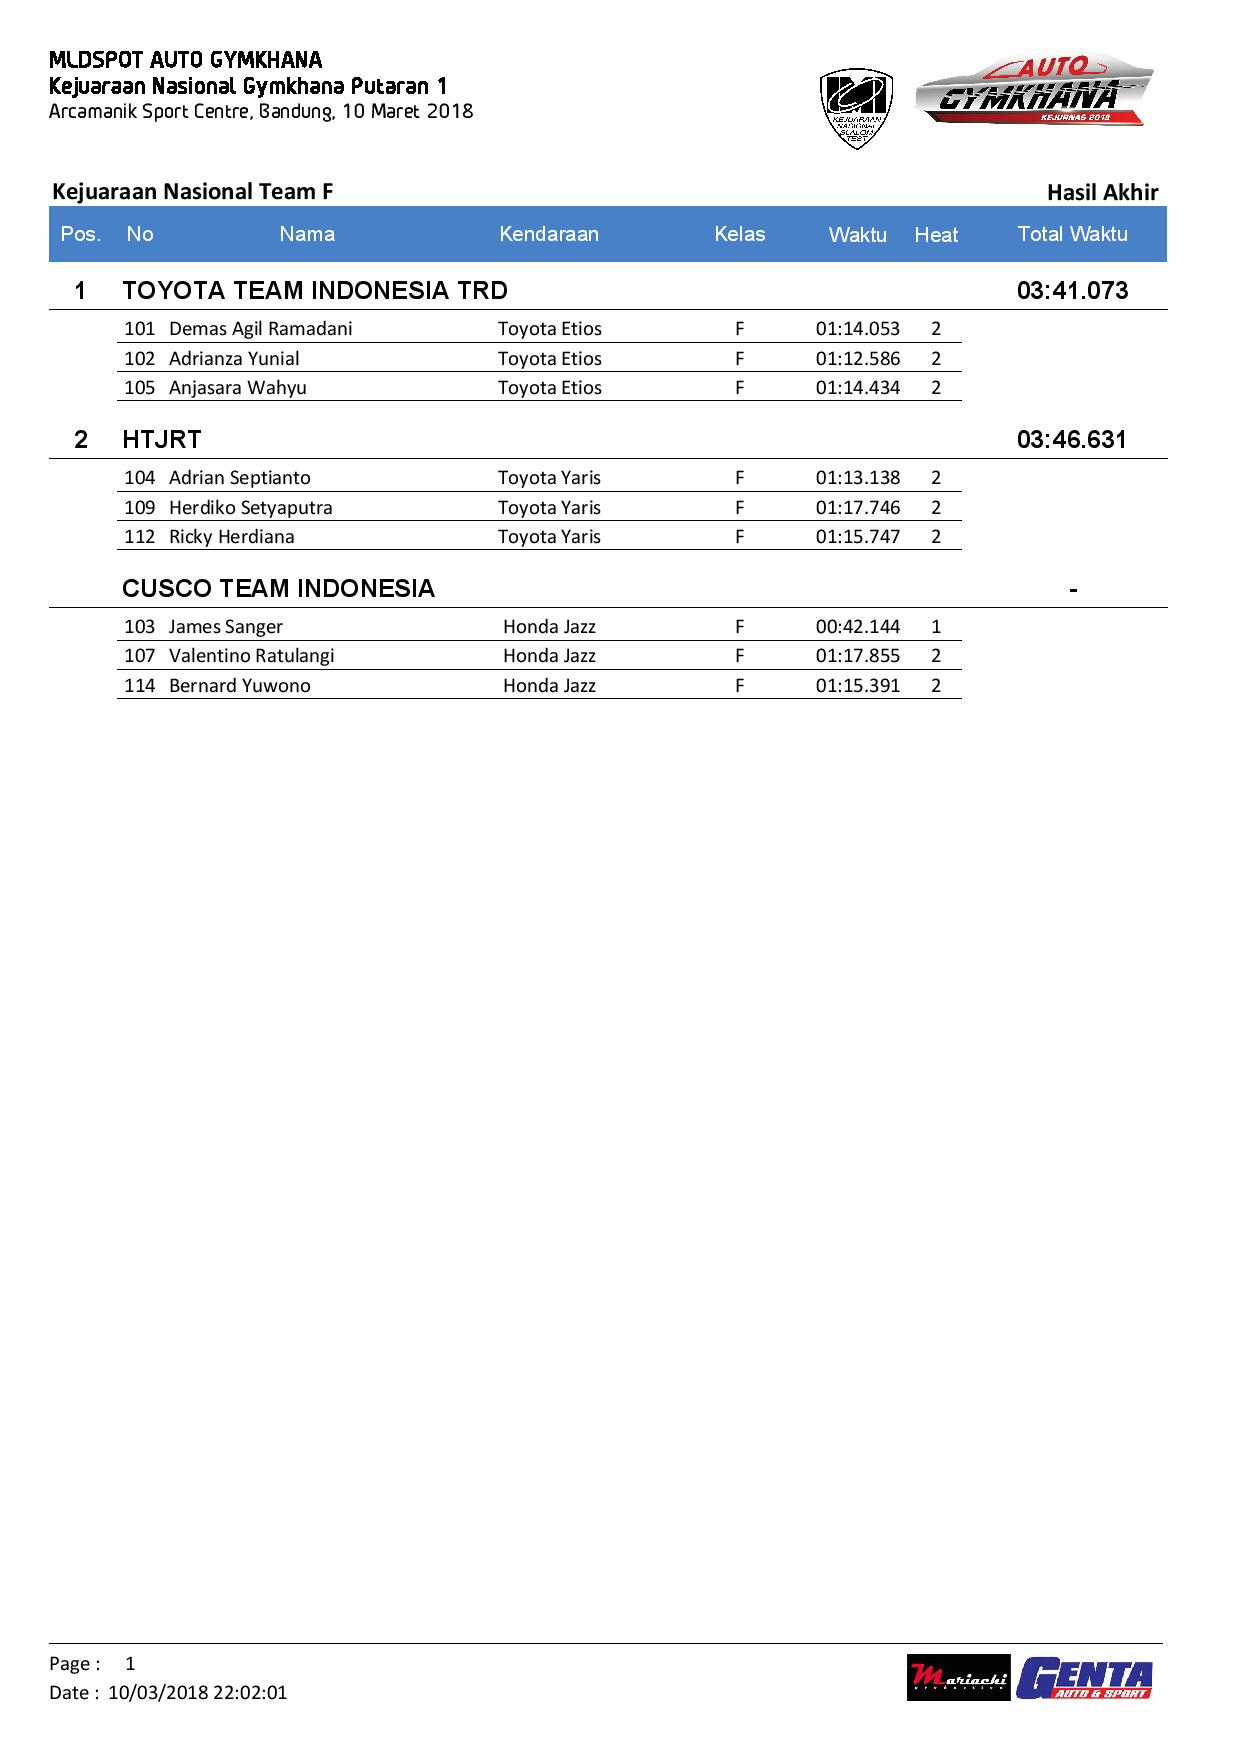 MLDSPOT AUTO GYMKAHANA RD1-page-009